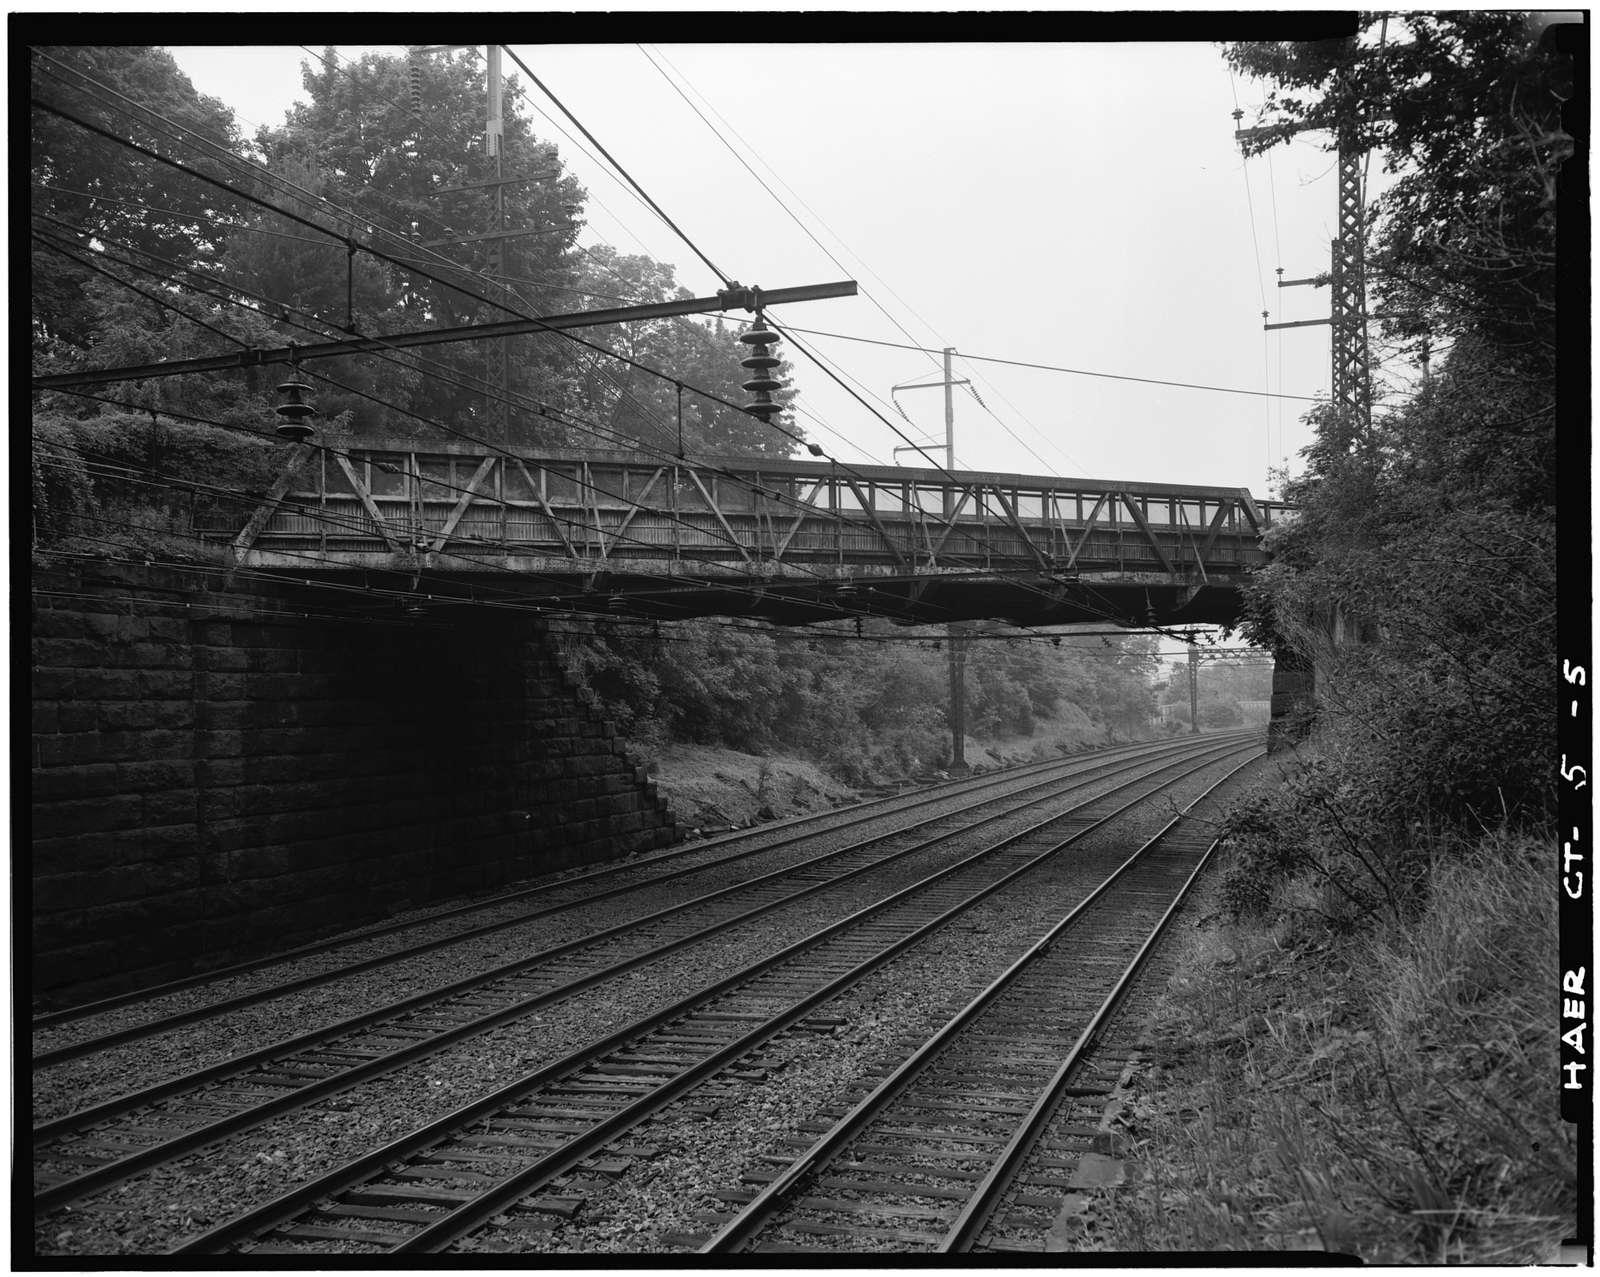 Beachside Avenue Bridge, Westport, Fairfield County, CT